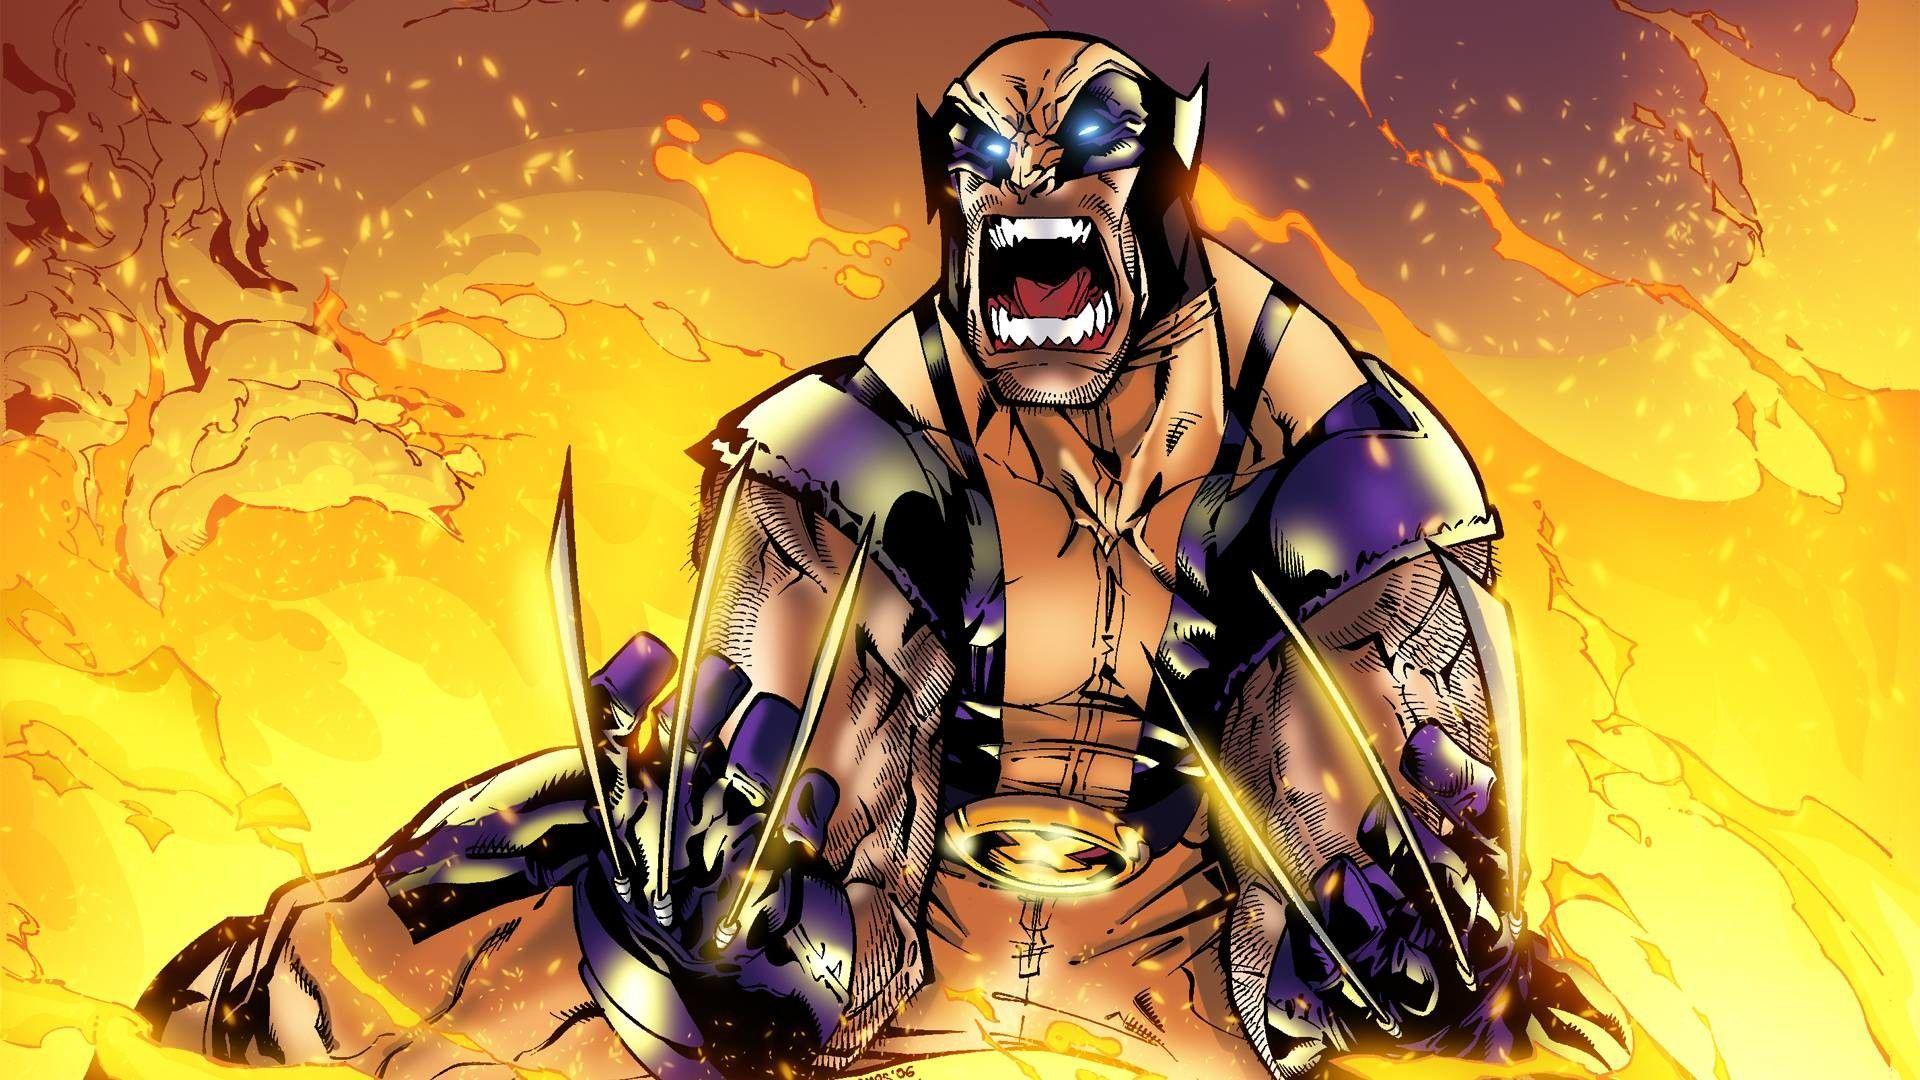 67d87080413 Wolverine Comic Wallpaper 1920x1080 photos | Marvel | Wolverine ...